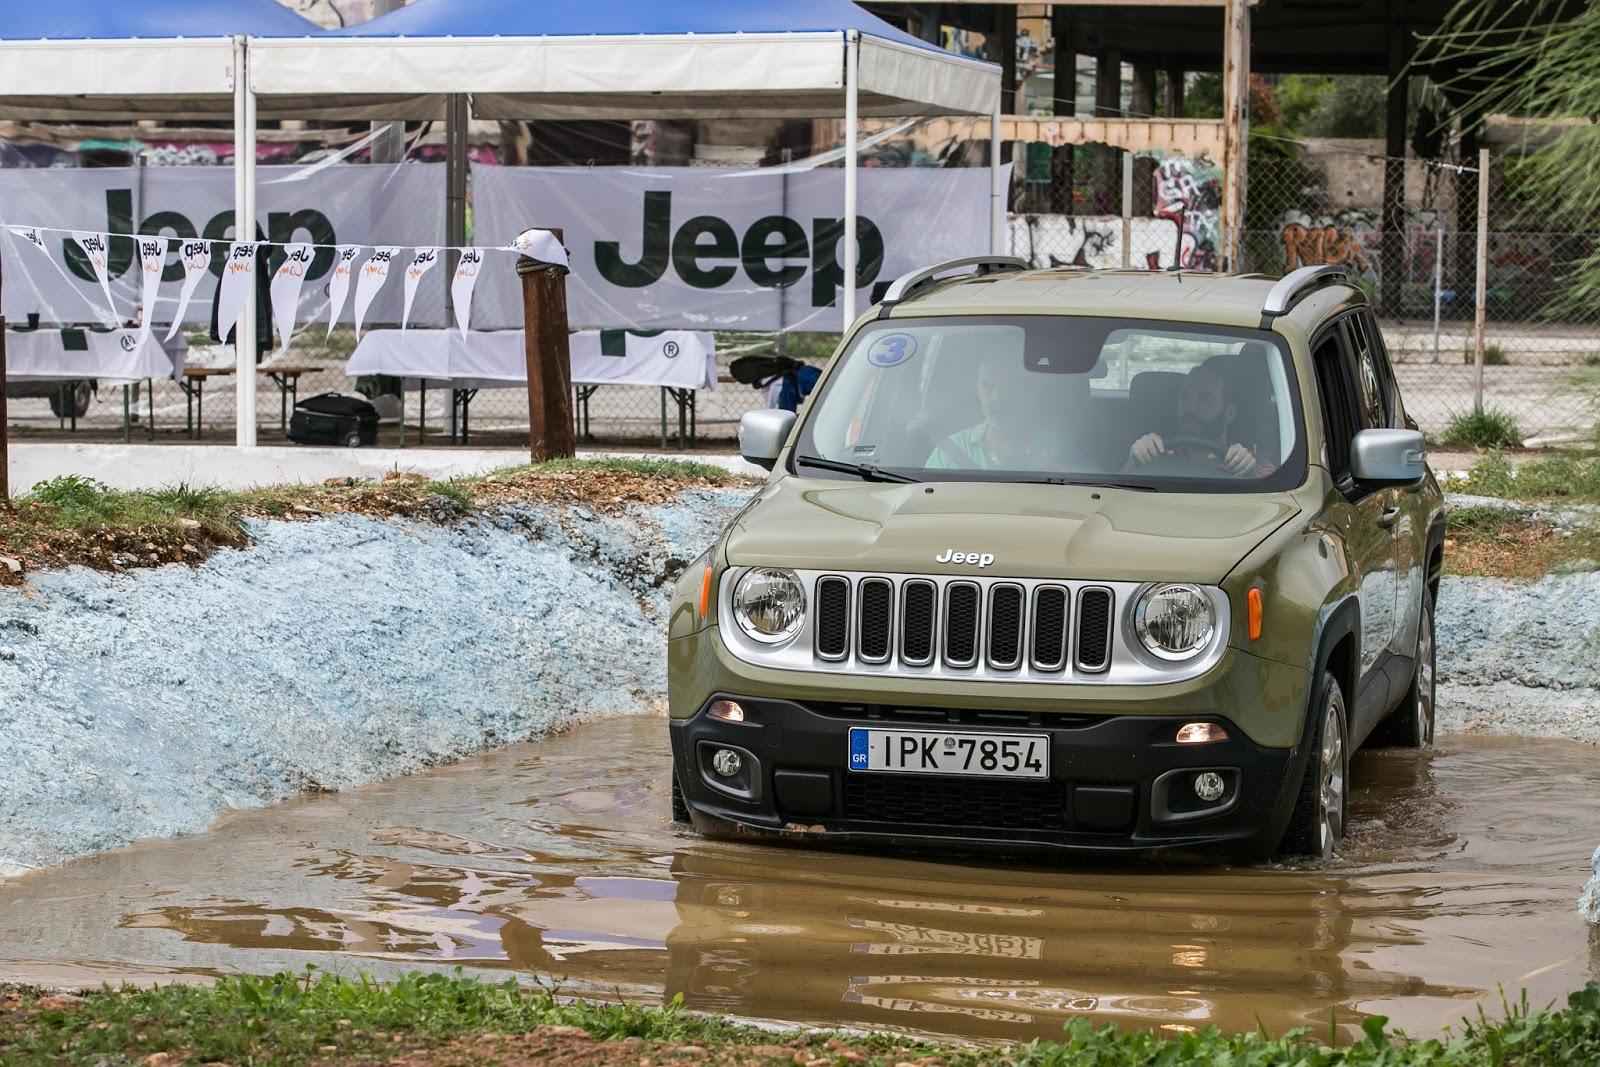 KF 1614 Πετάμε ένα Jeep Renegade σε λάσπες, πέτρες, άμμο, λίμνες. Θα τα καταφέρει; Jeep, Jeep Renegade, Renegade, SUV, TEST, zblog, ΔΟΚΙΜΕΣ